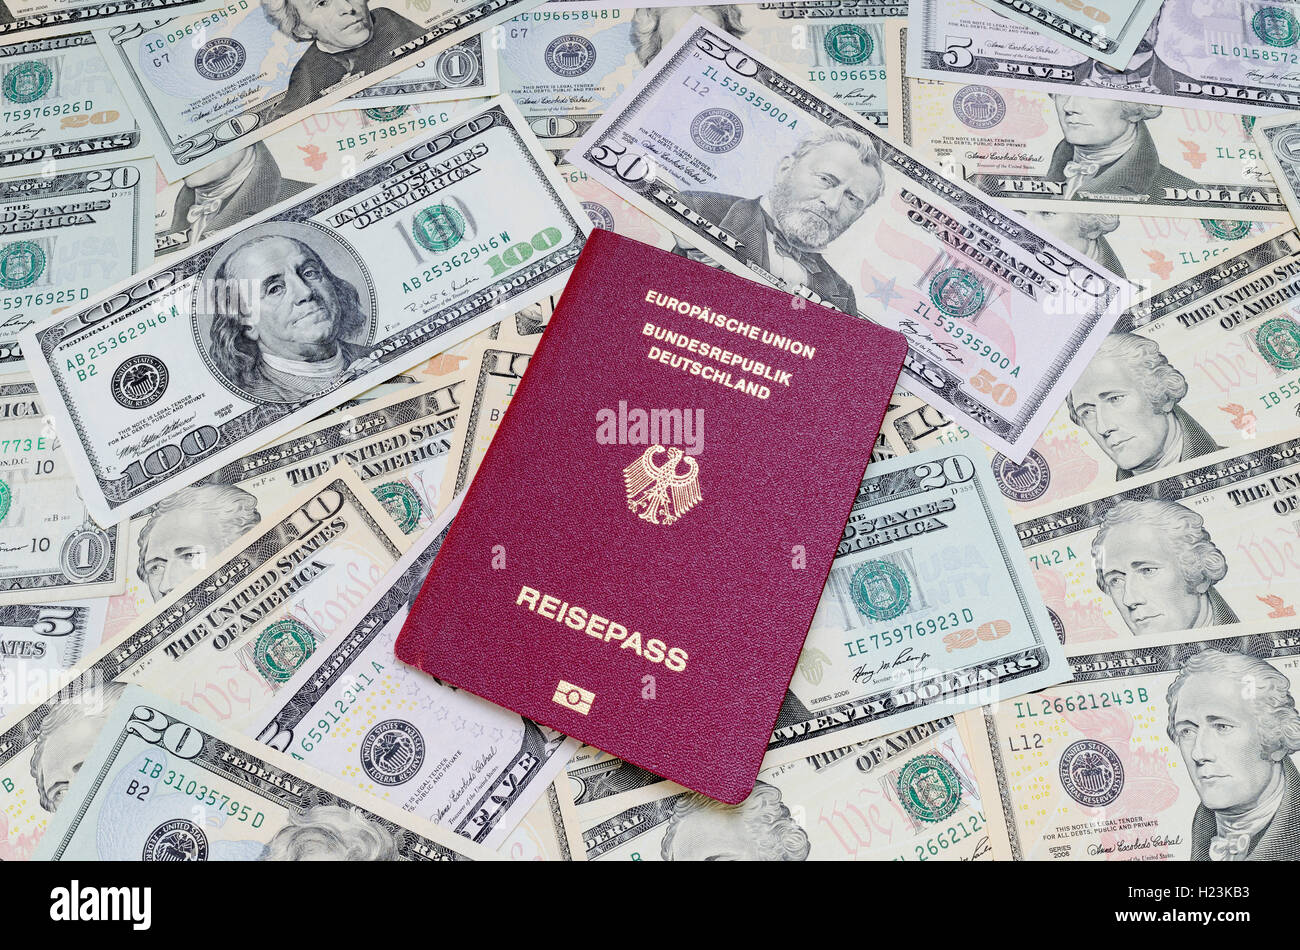 German passport and US dollar bills - Stock Image